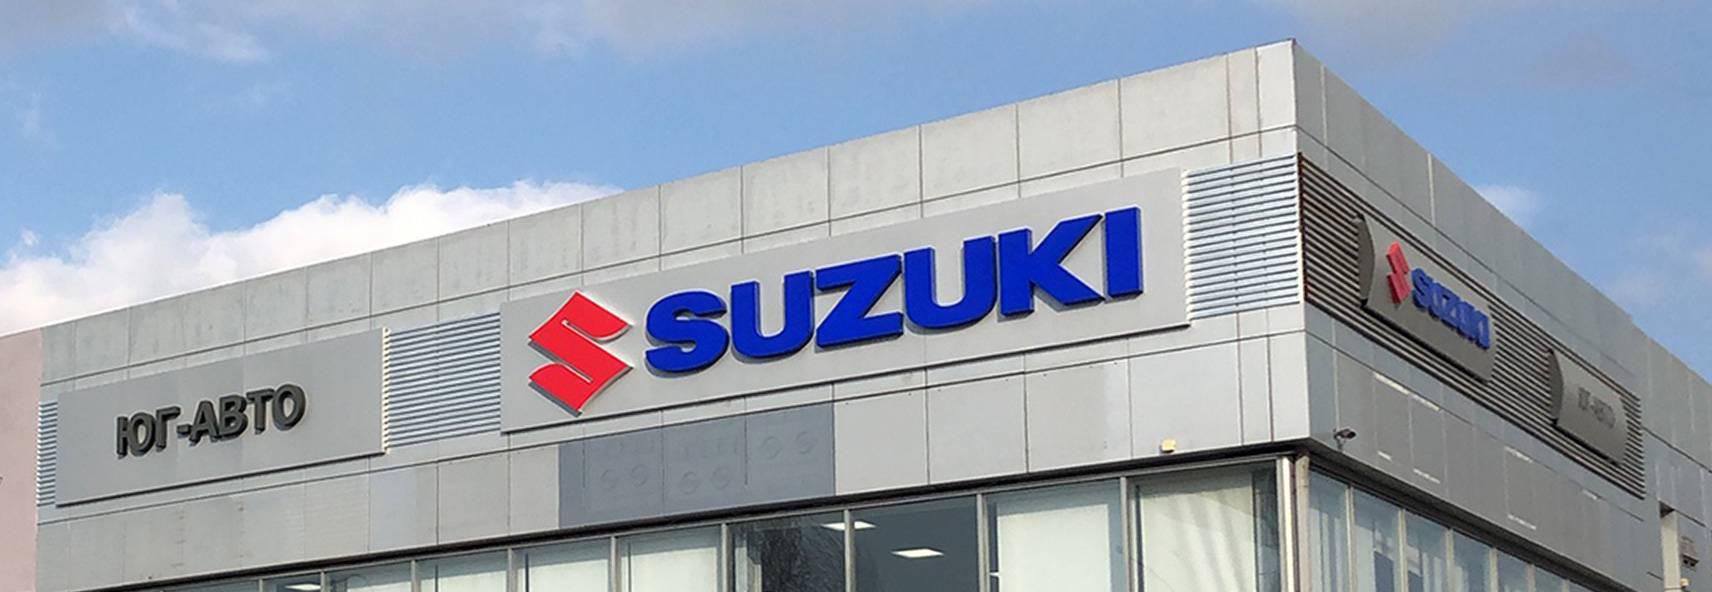 Suzuki, Дзержинского